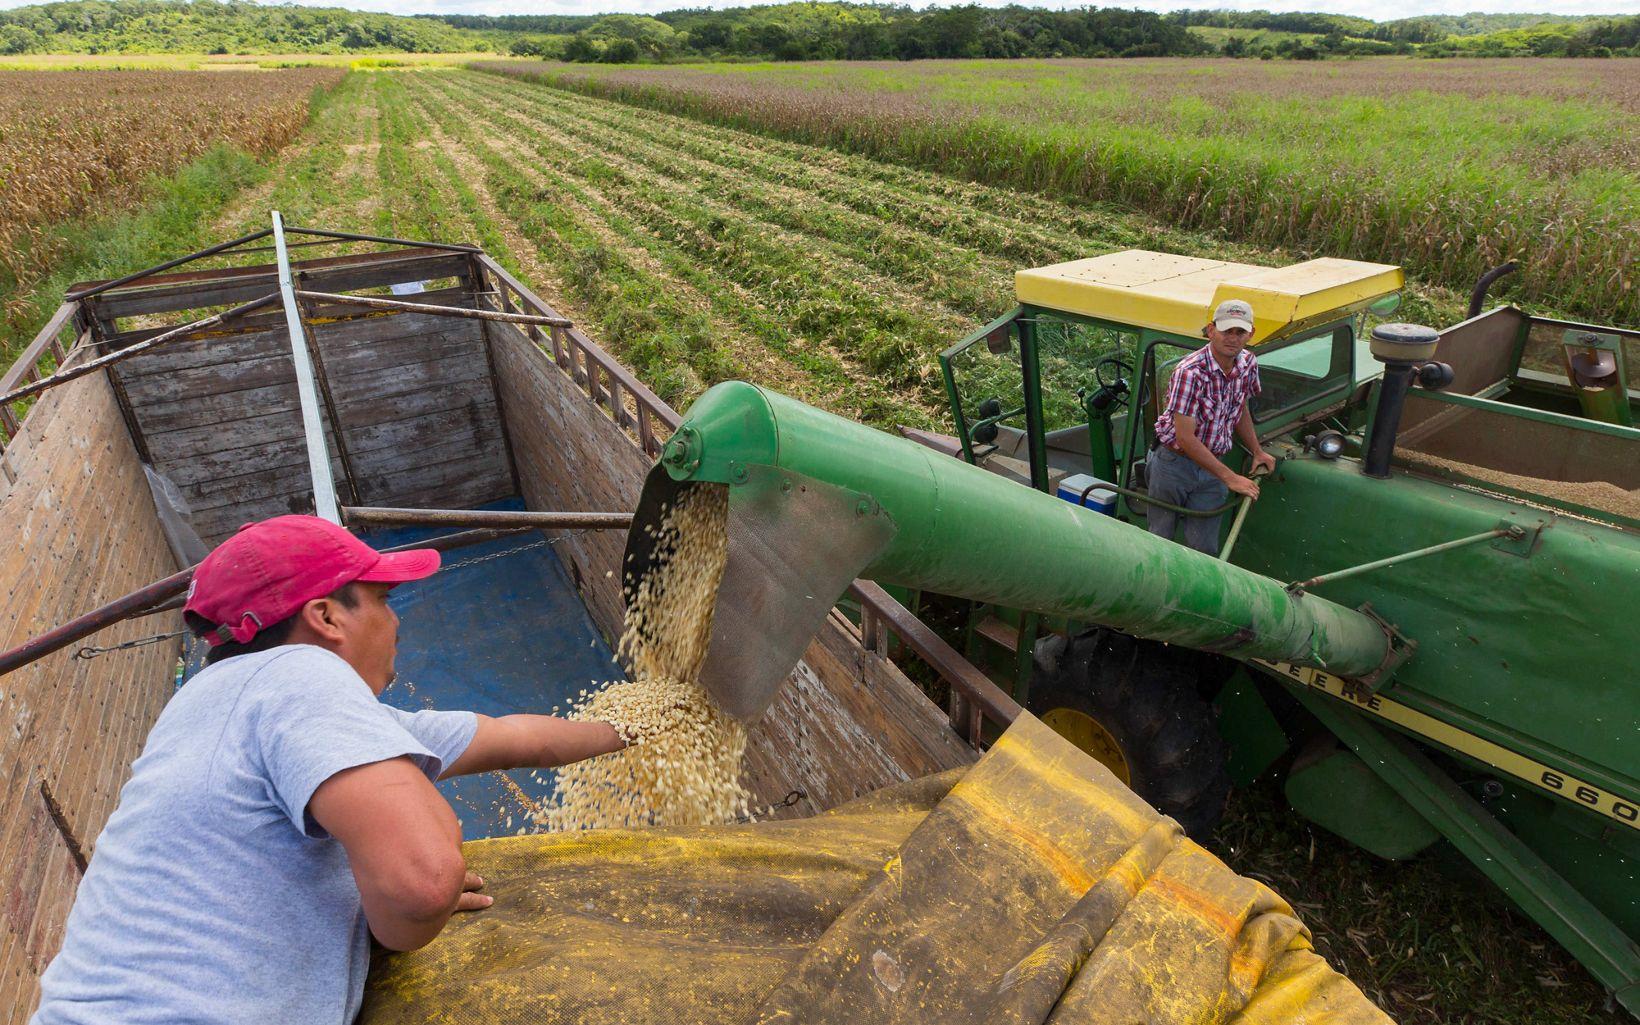 agricultura sostenible en México